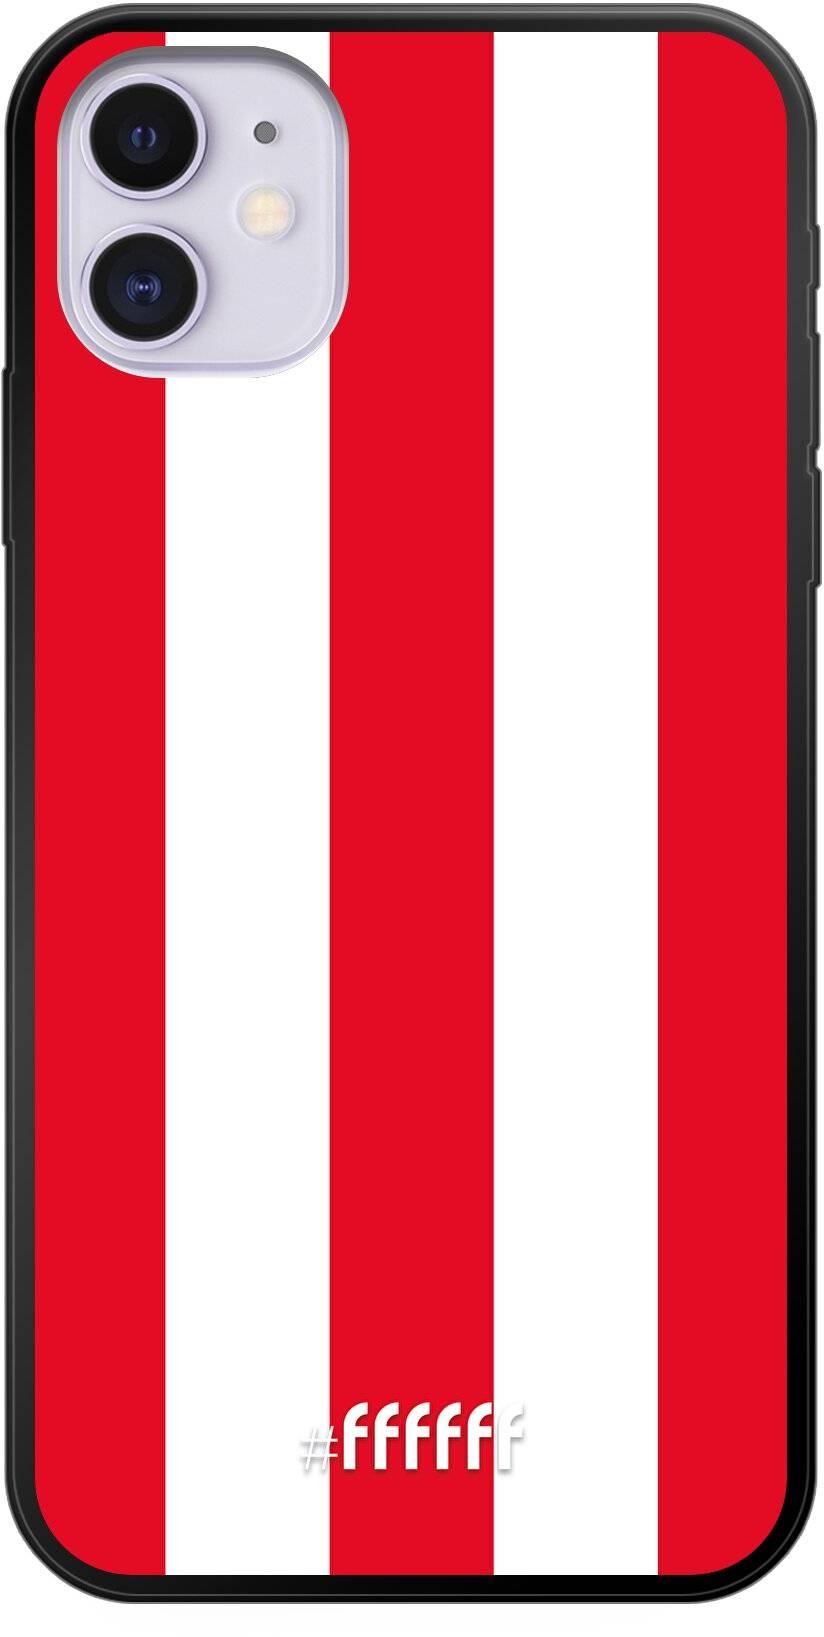 Sparta Rotterdam iPhone 11